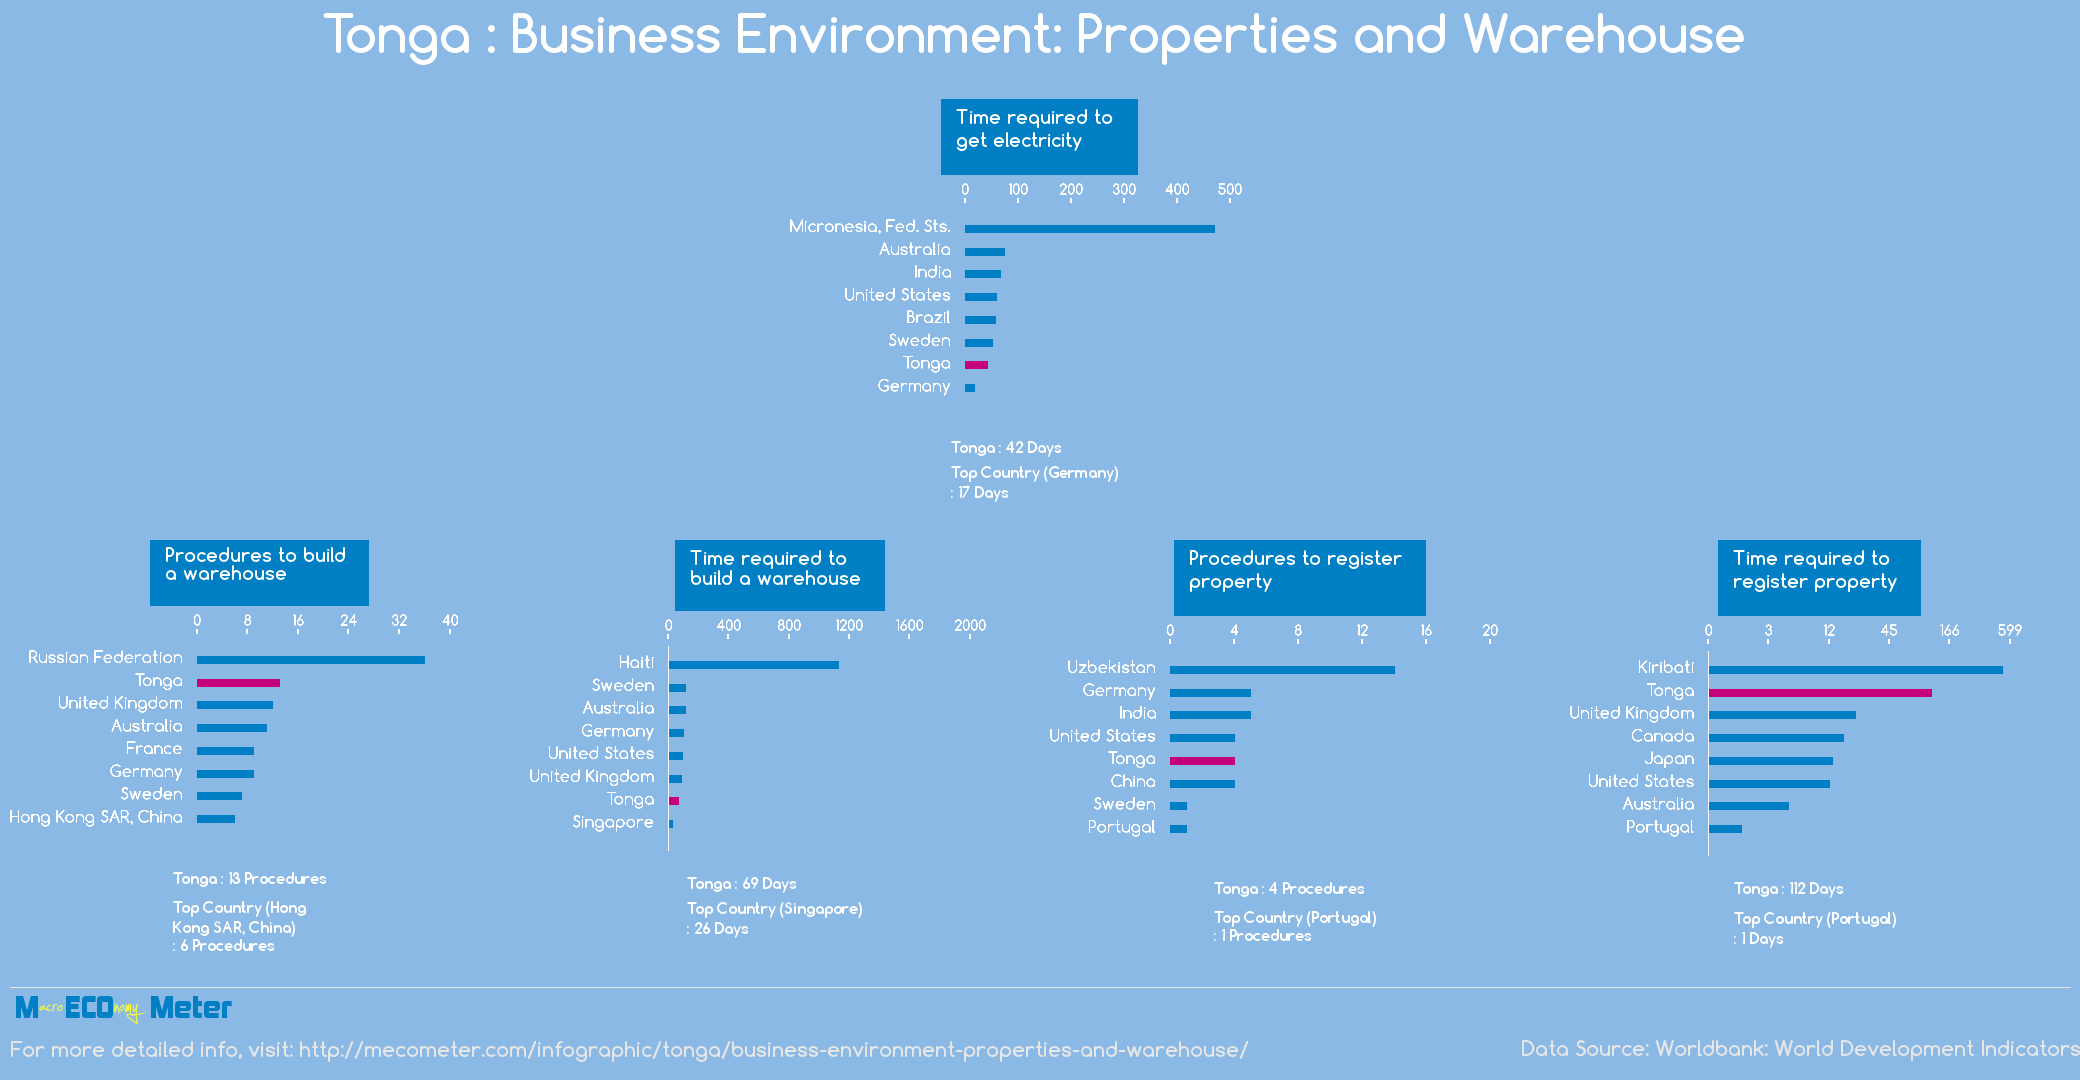 Tonga : Business Environment: Properties and Warehouse